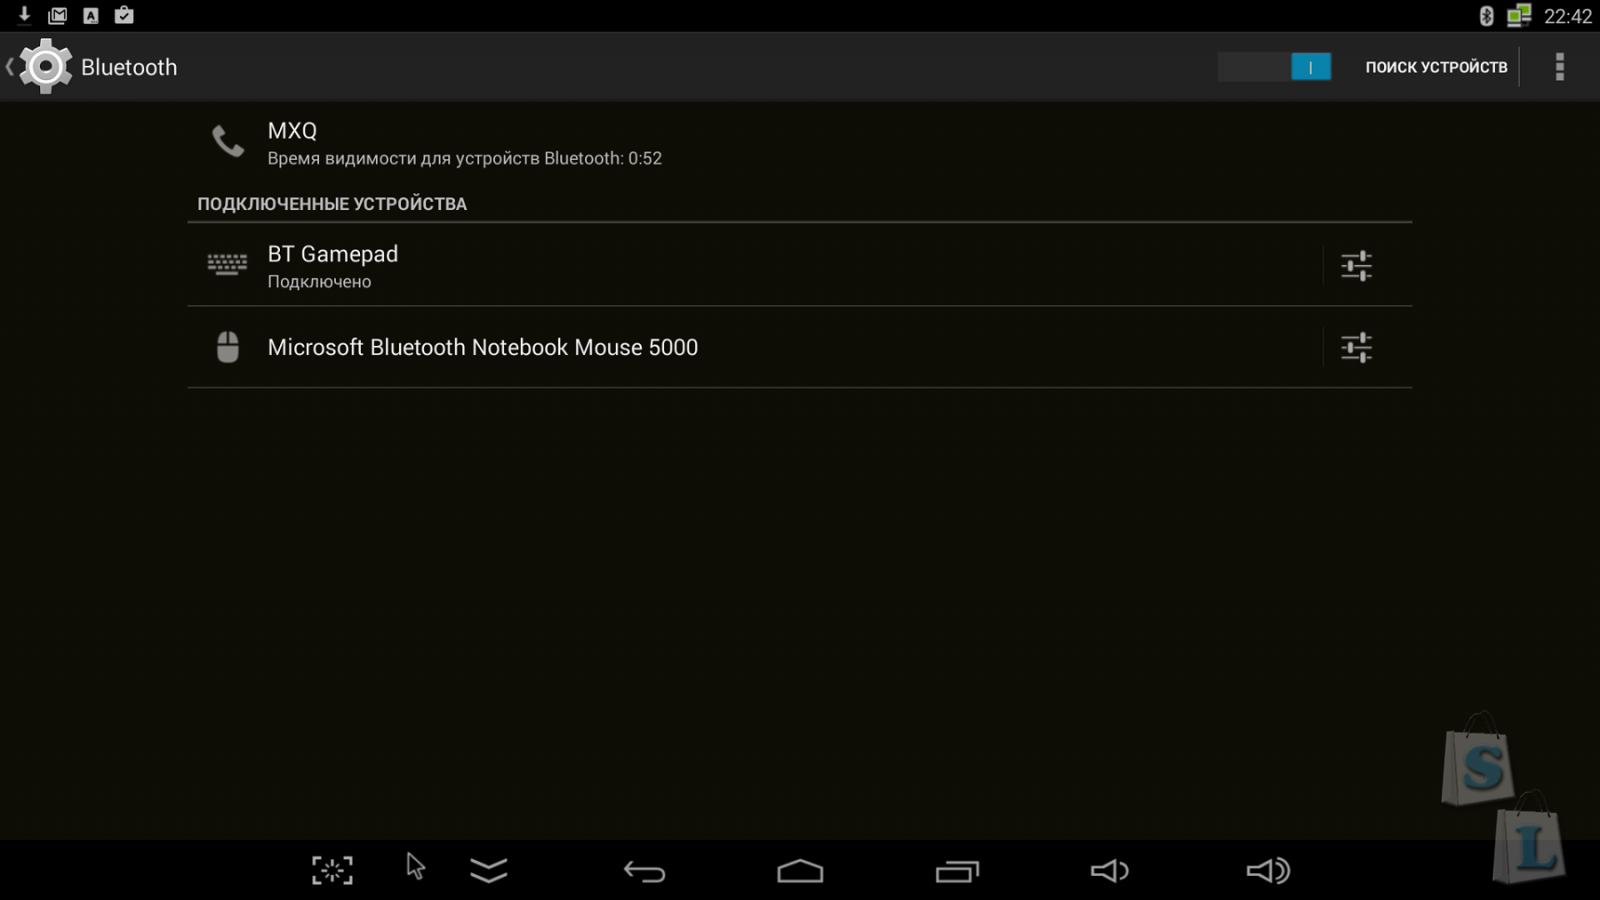 GearBest: Геймпад - джойстик для Android